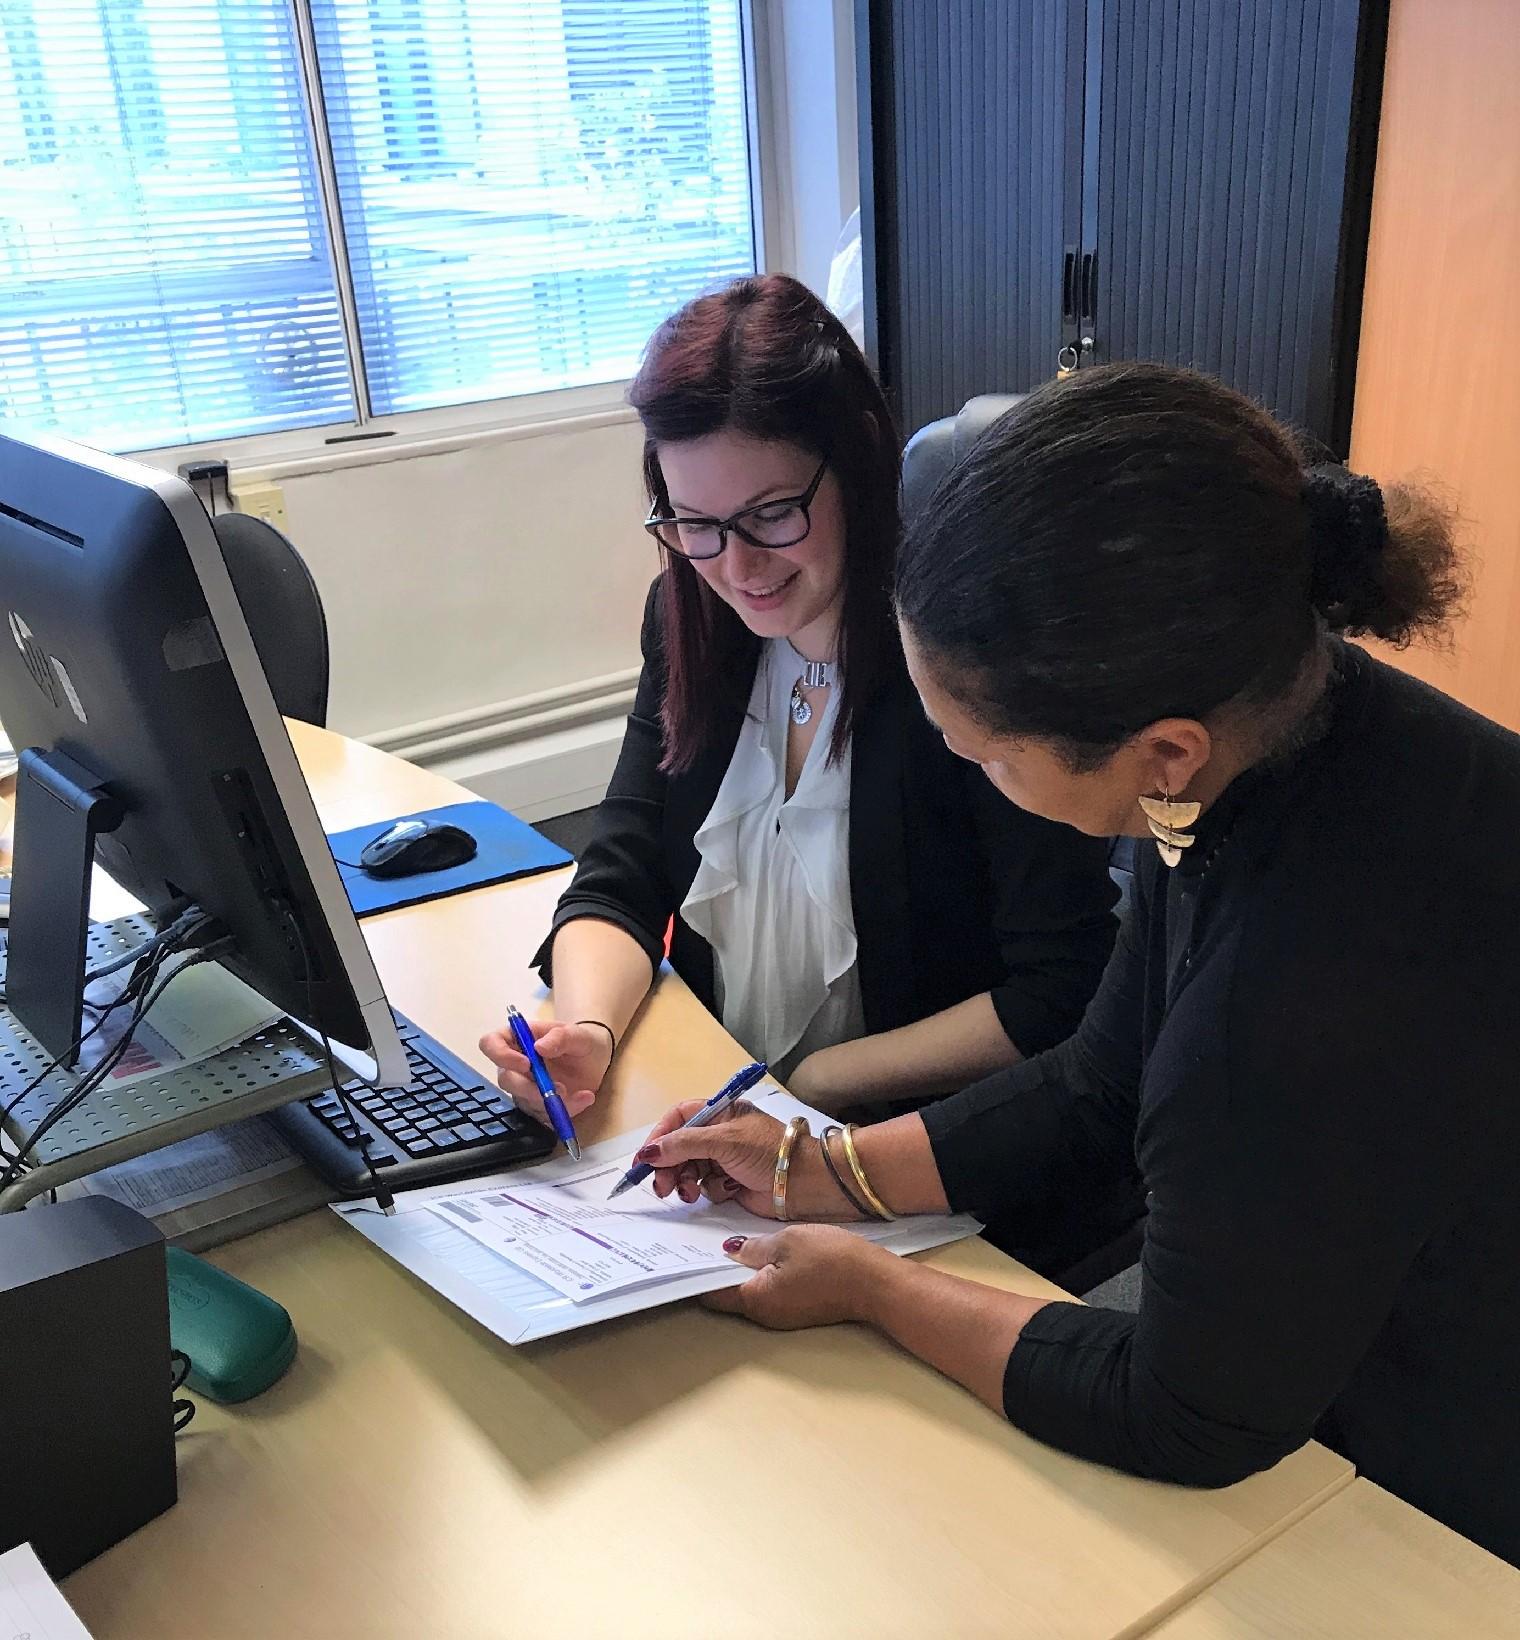 meet-the-team-cth-assessments-coordinator-rebecca-lauder-article-img-2